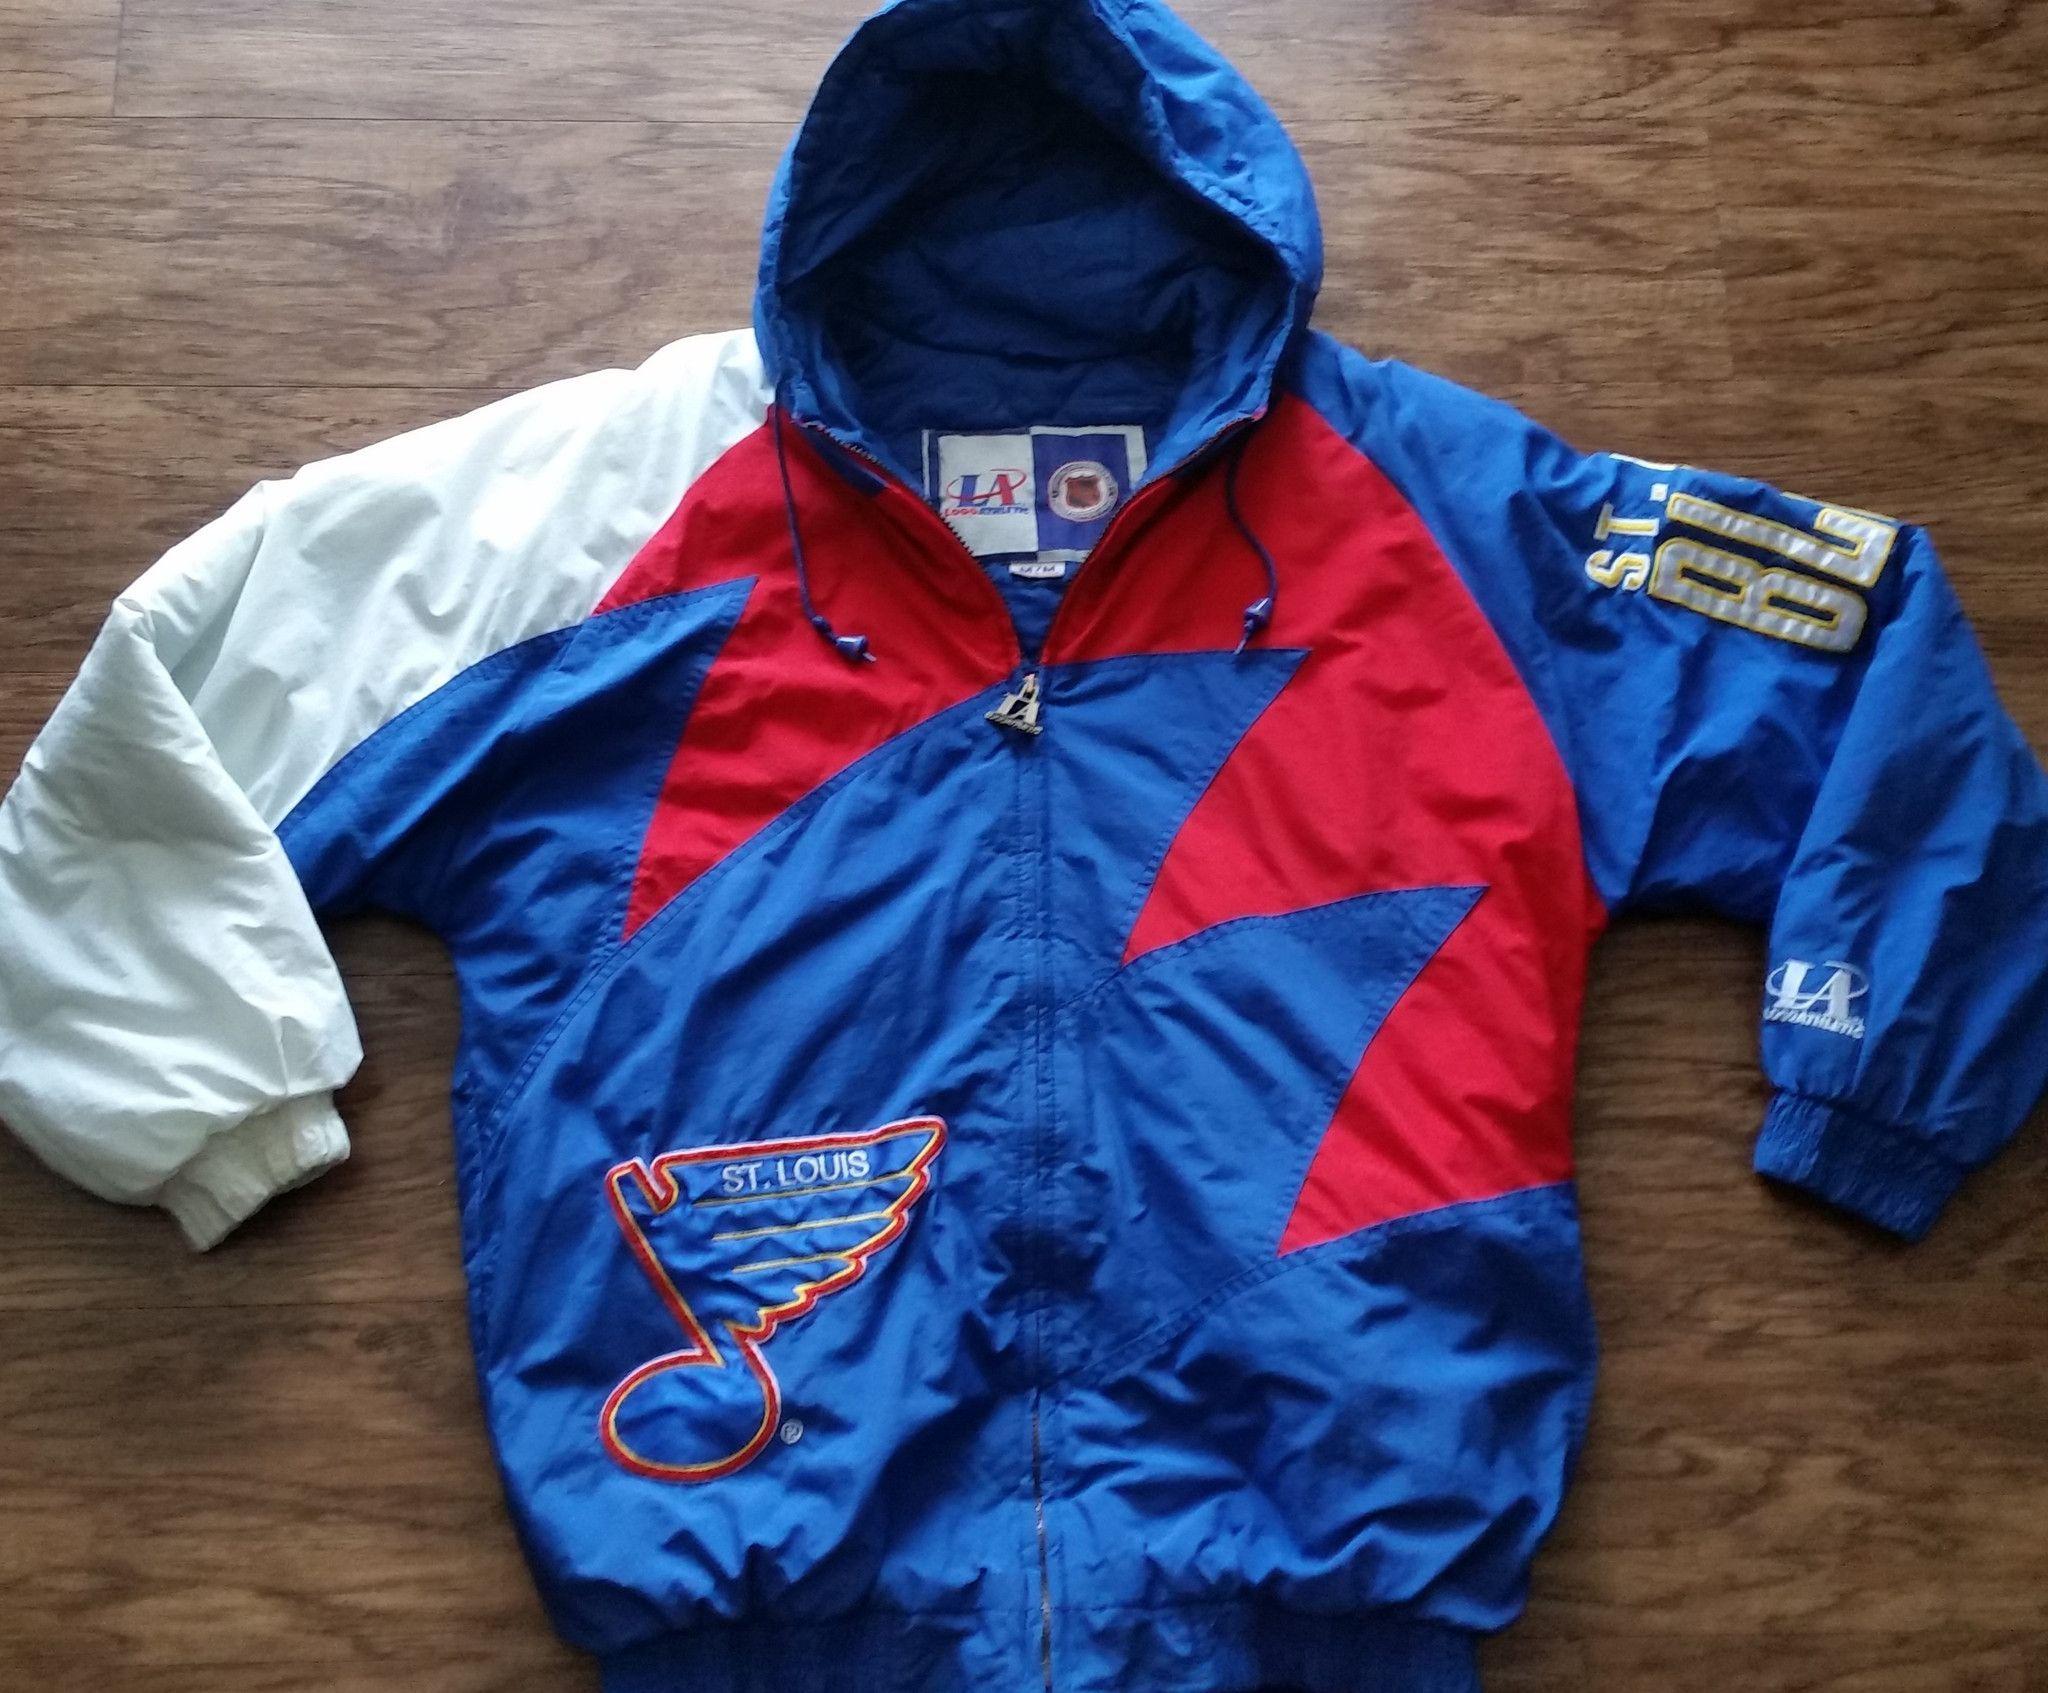 St Louis Blues Logo Athletic Sharktooth Jacket Vintage Nhl Hockey Coat Parka Mens Medium Herren Mode Mode Herrin